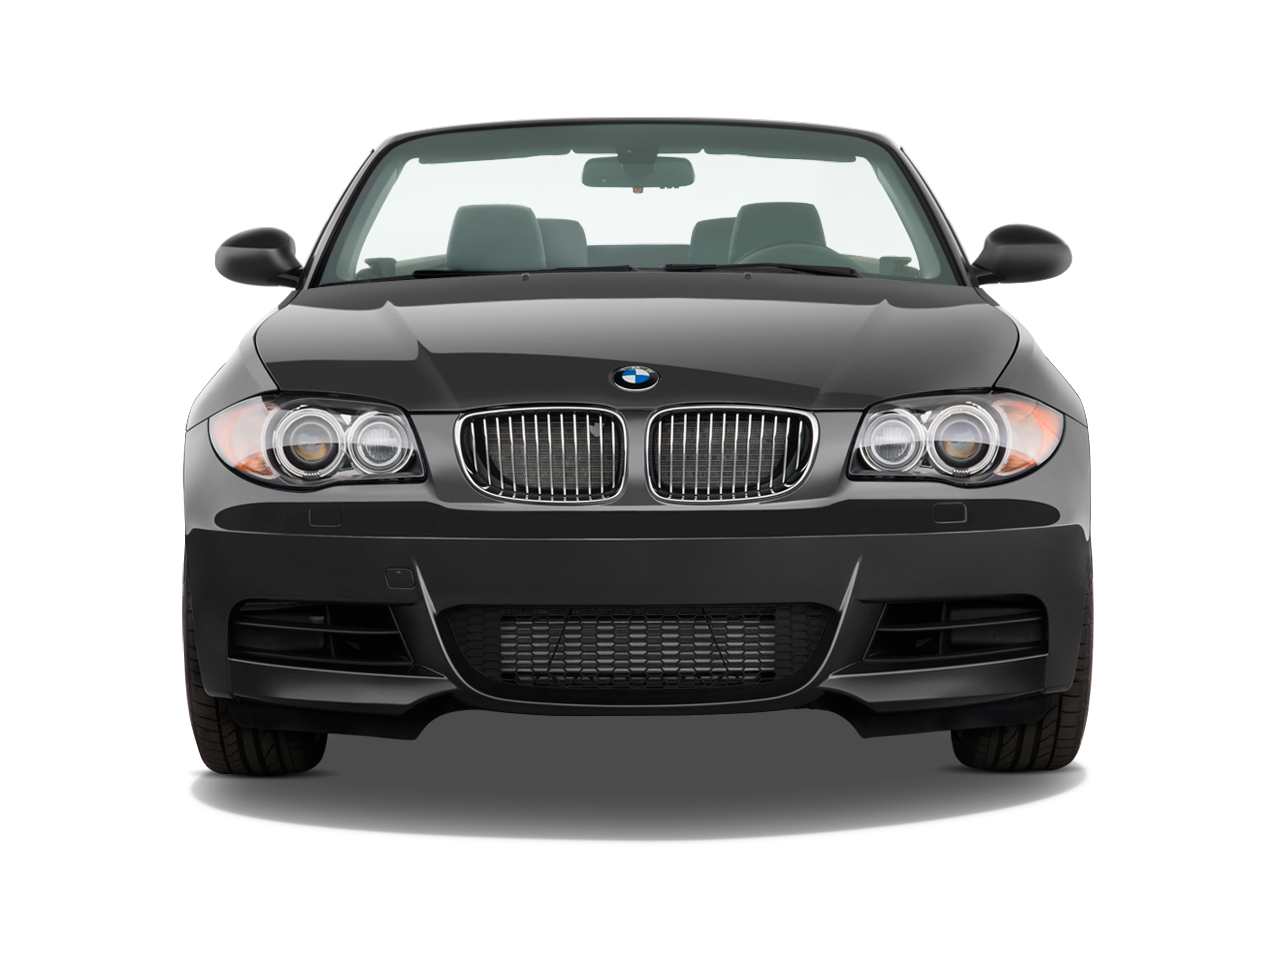 Bmw 128i Convertible >> 2009 BMW 128i Convertible - BMW Luxury Convertible Review - Automobile Magazine